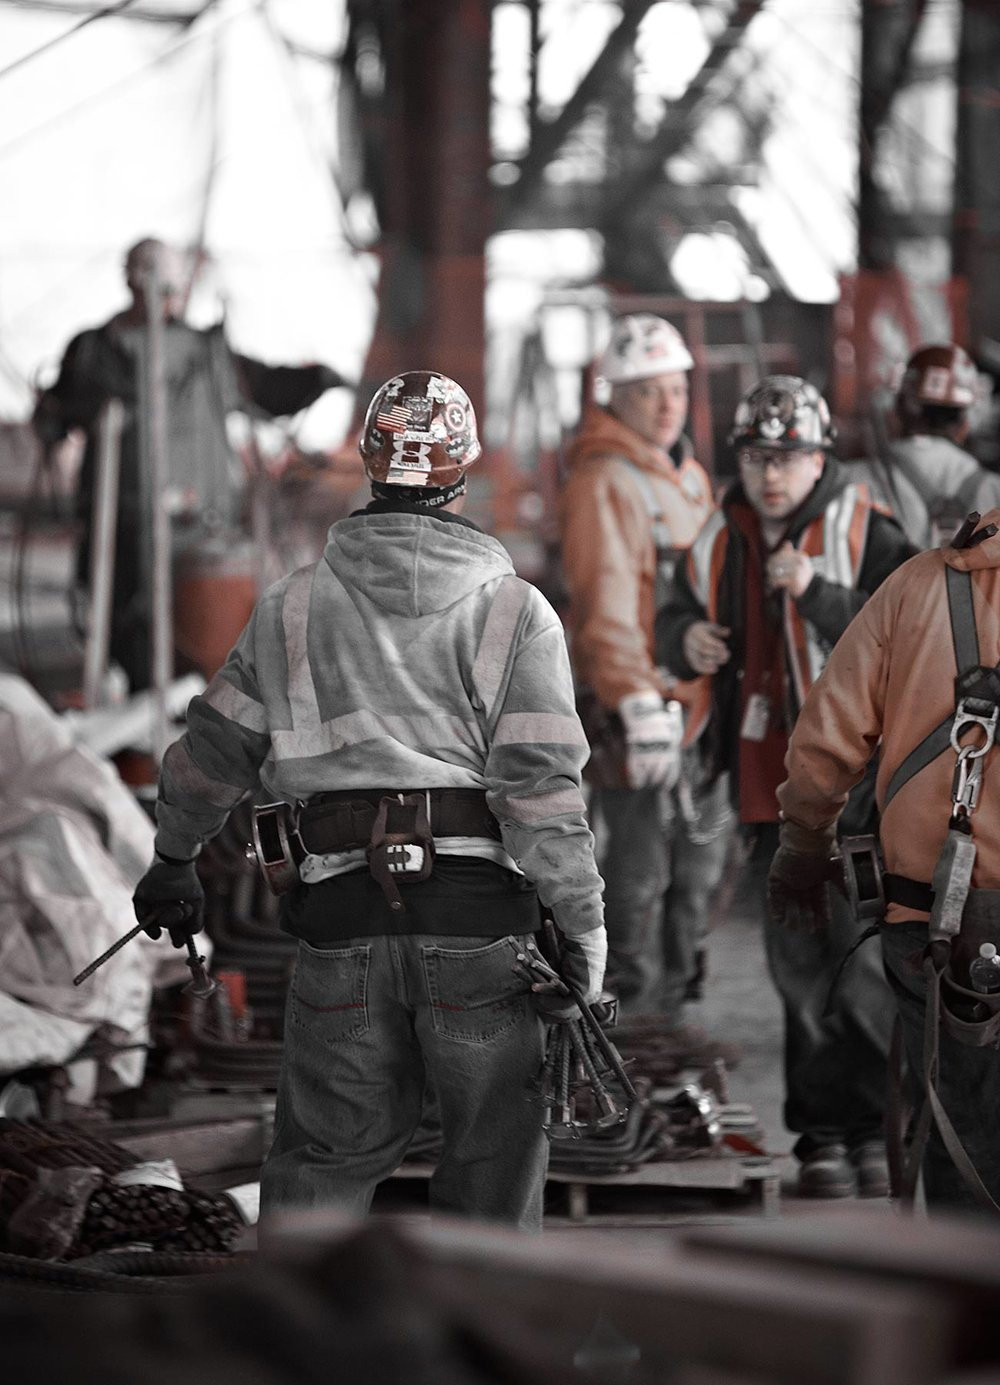 Jeremy-Frechette-OWTC-Construction-iron-workers-04.jpg